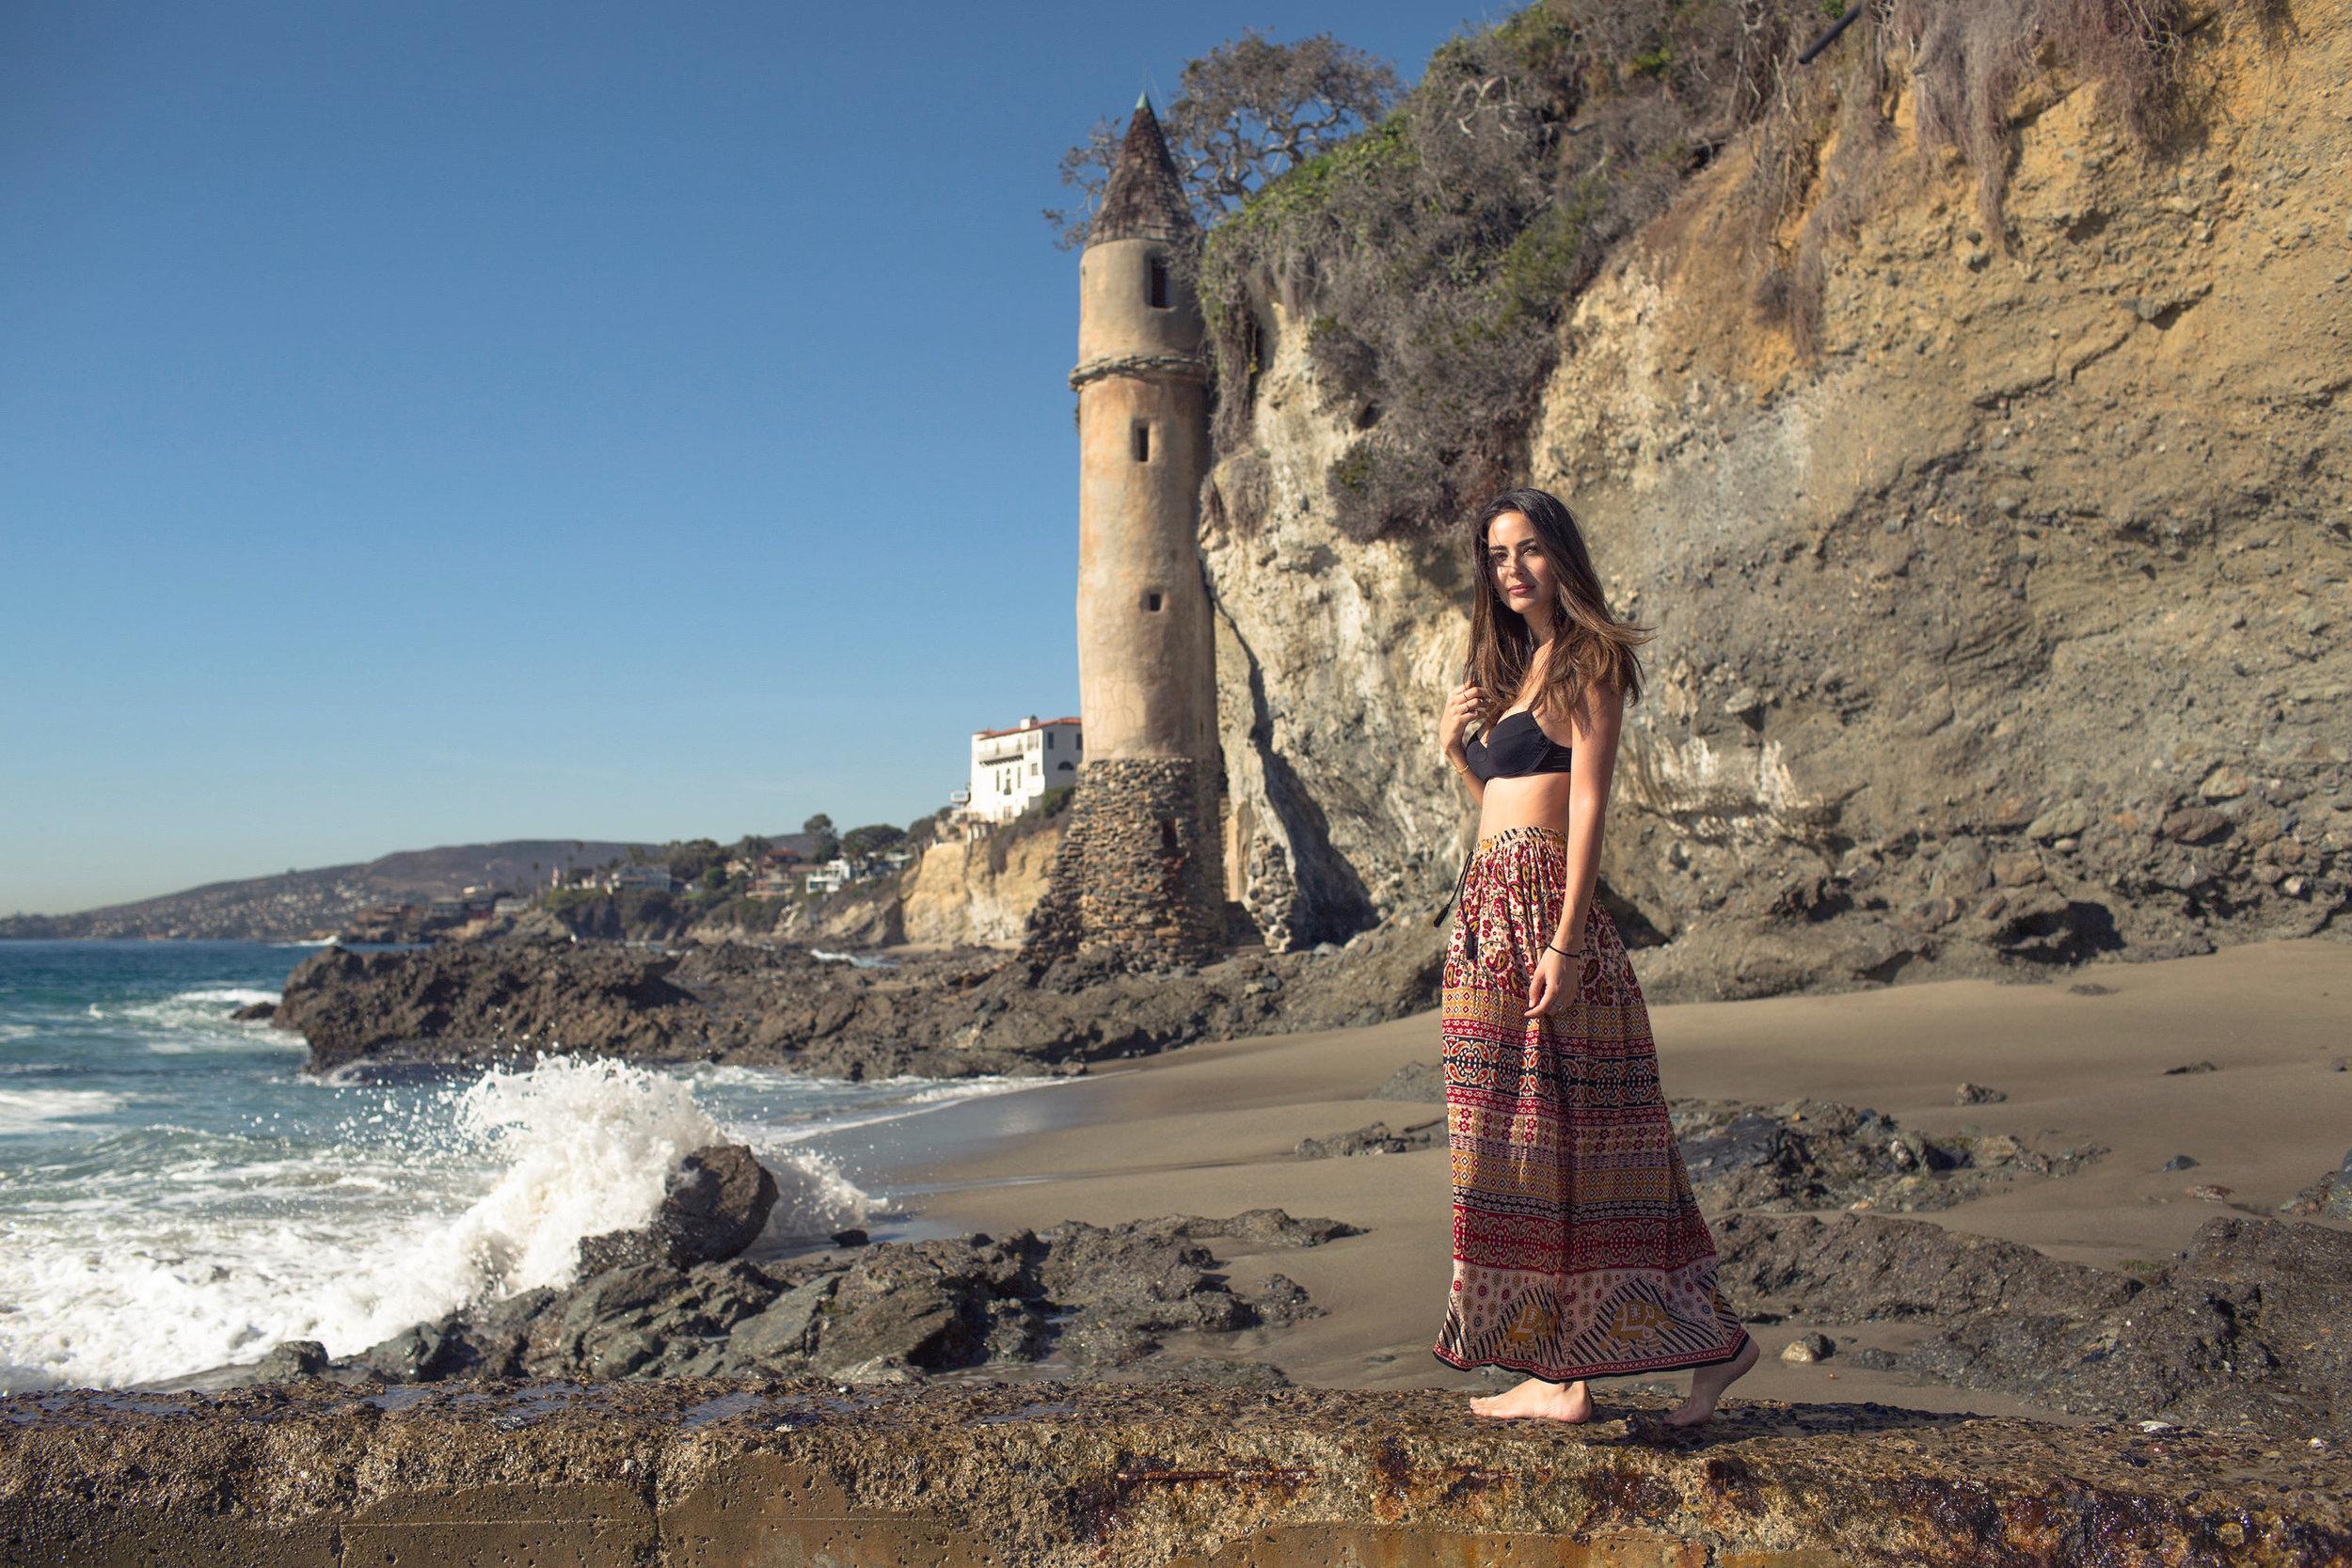 LAGUNA BEACH / PHOTO CREDIT:   LIANG GE